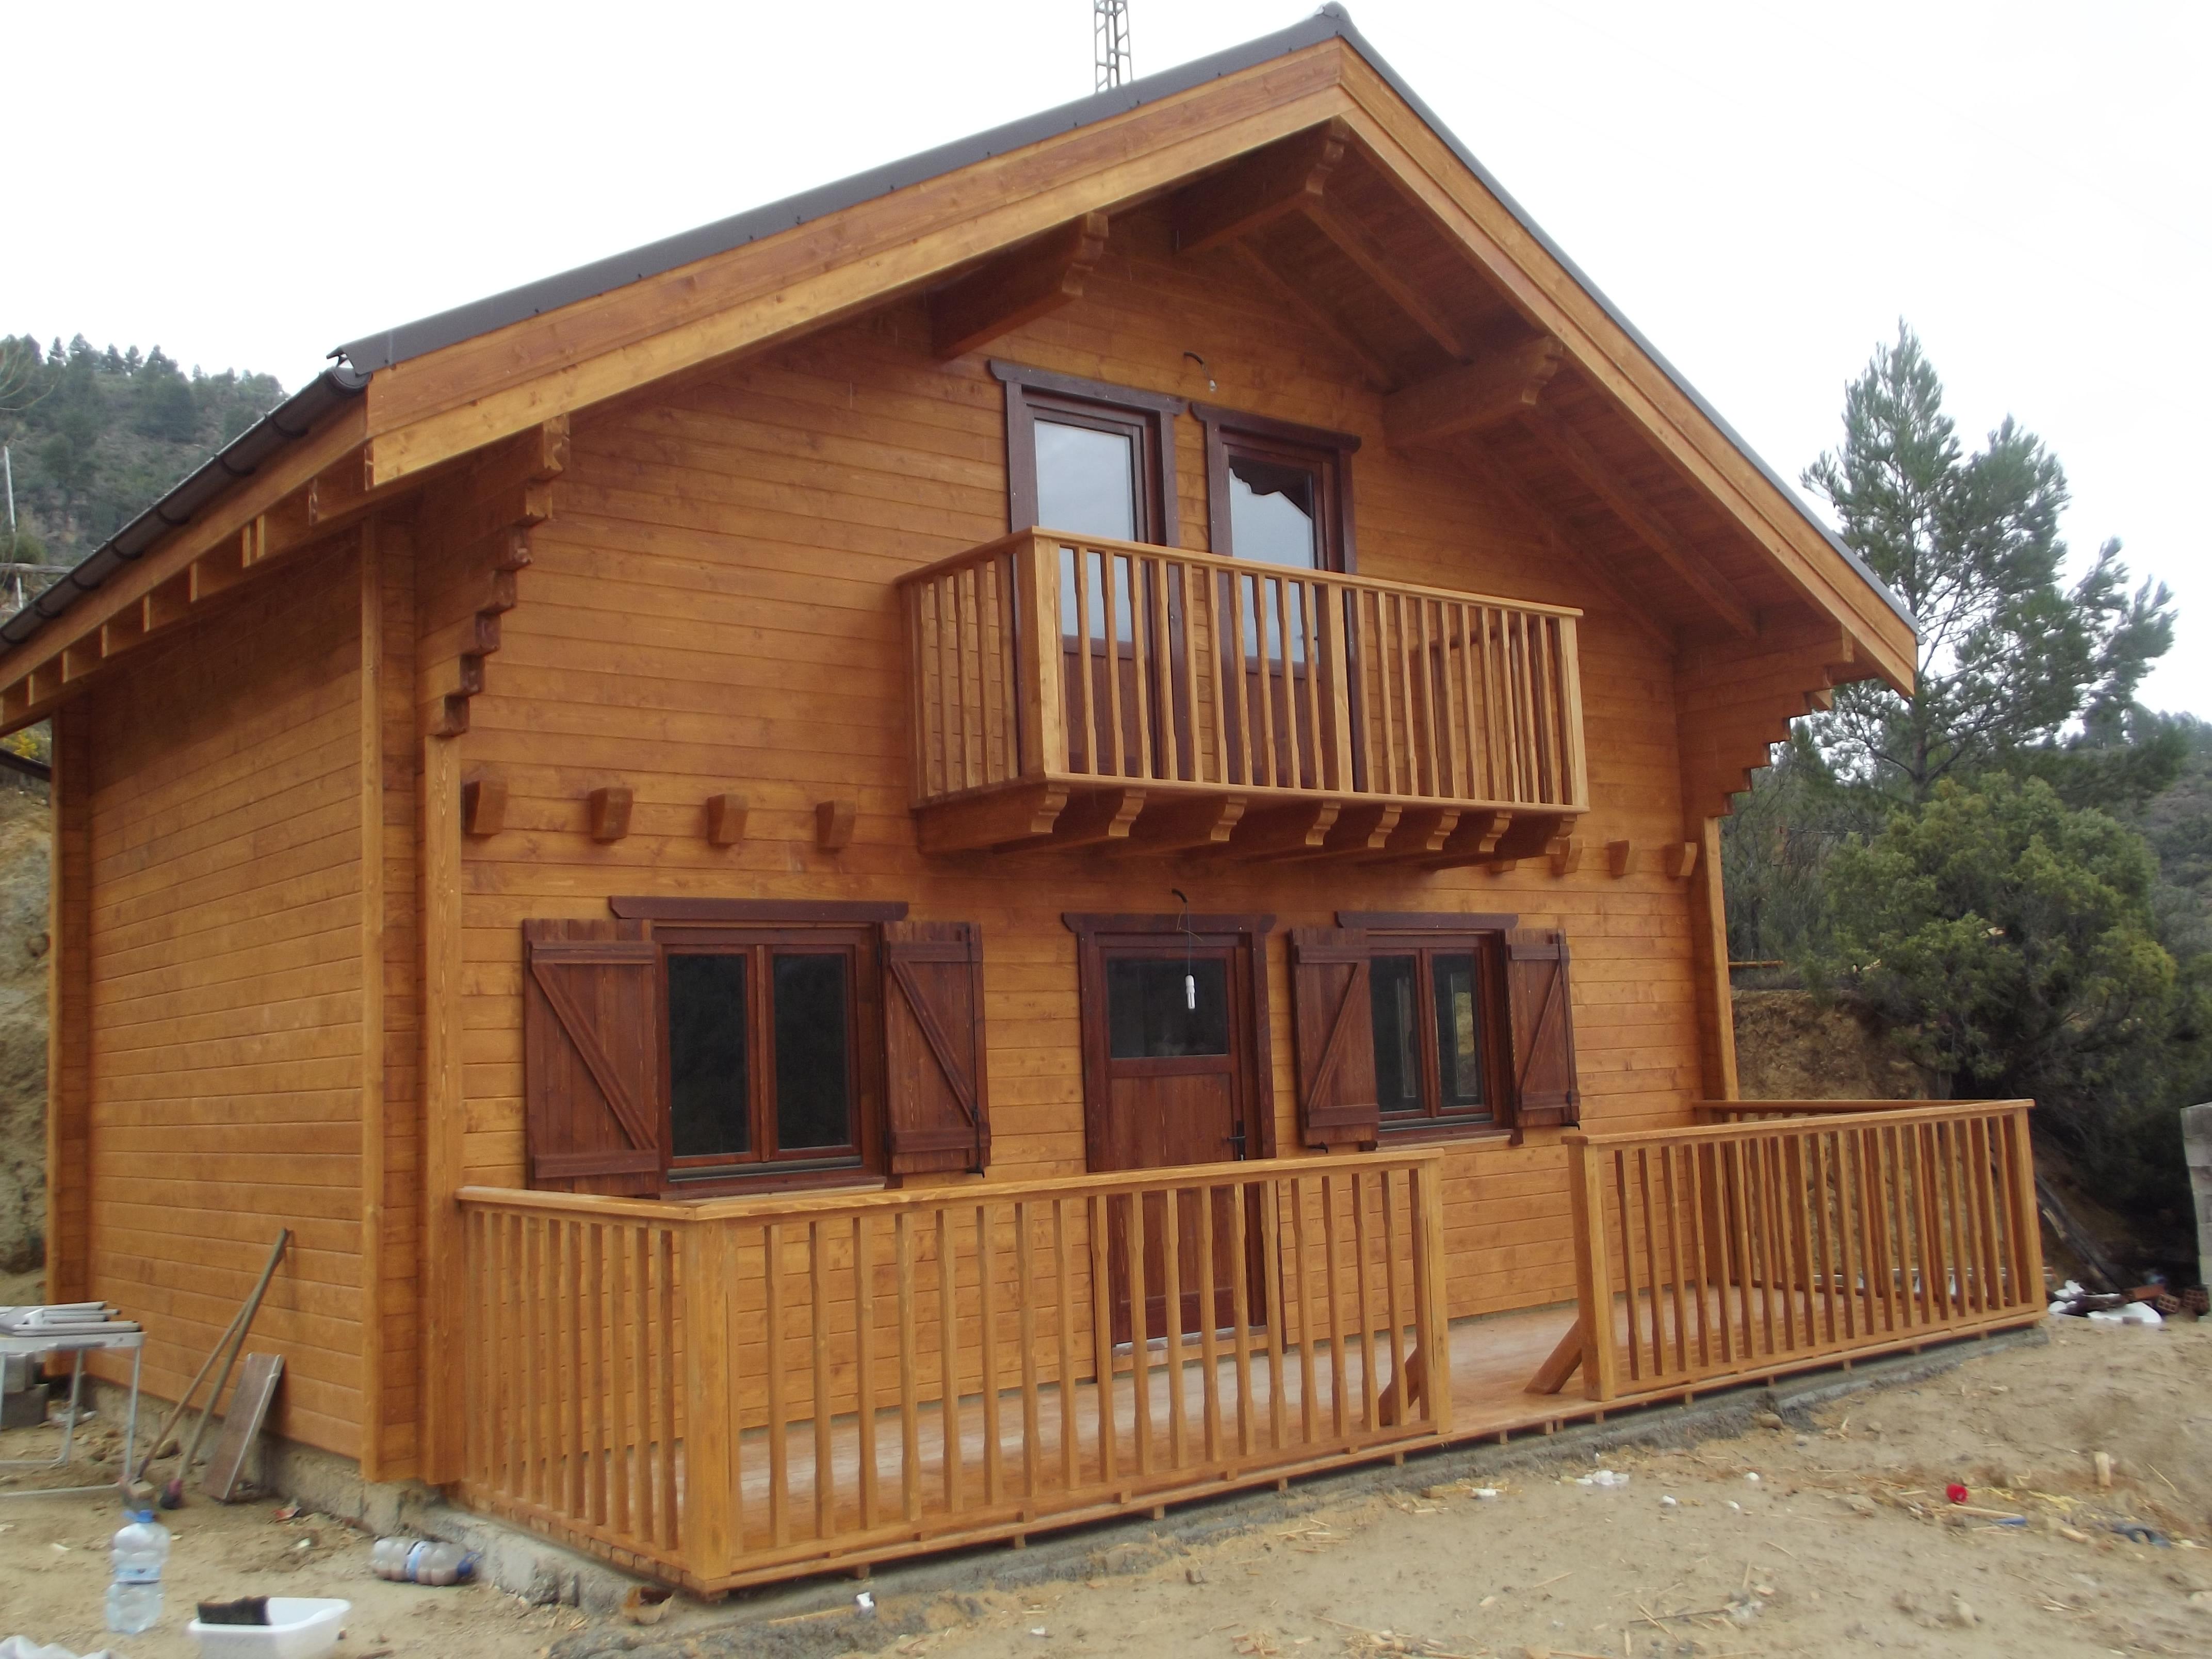 Lucrari de referinta casa din lemn dornaeco90 for Foto case americane